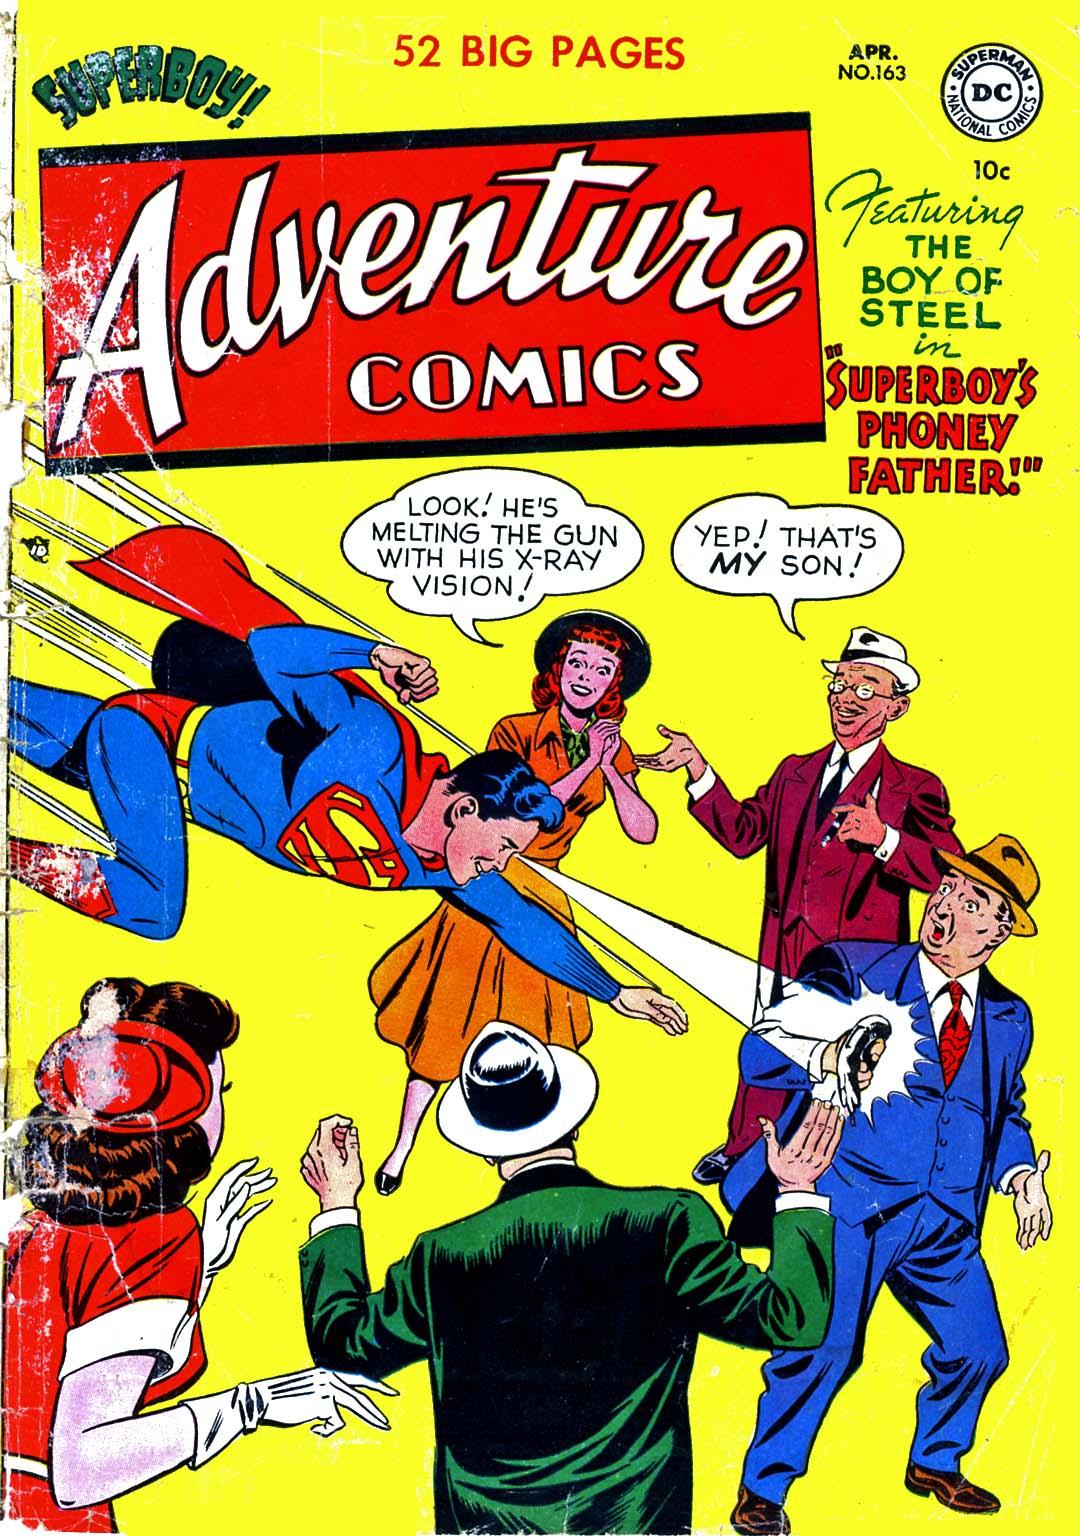 Read online Adventure Comics (1938) comic -  Issue #163 - 1